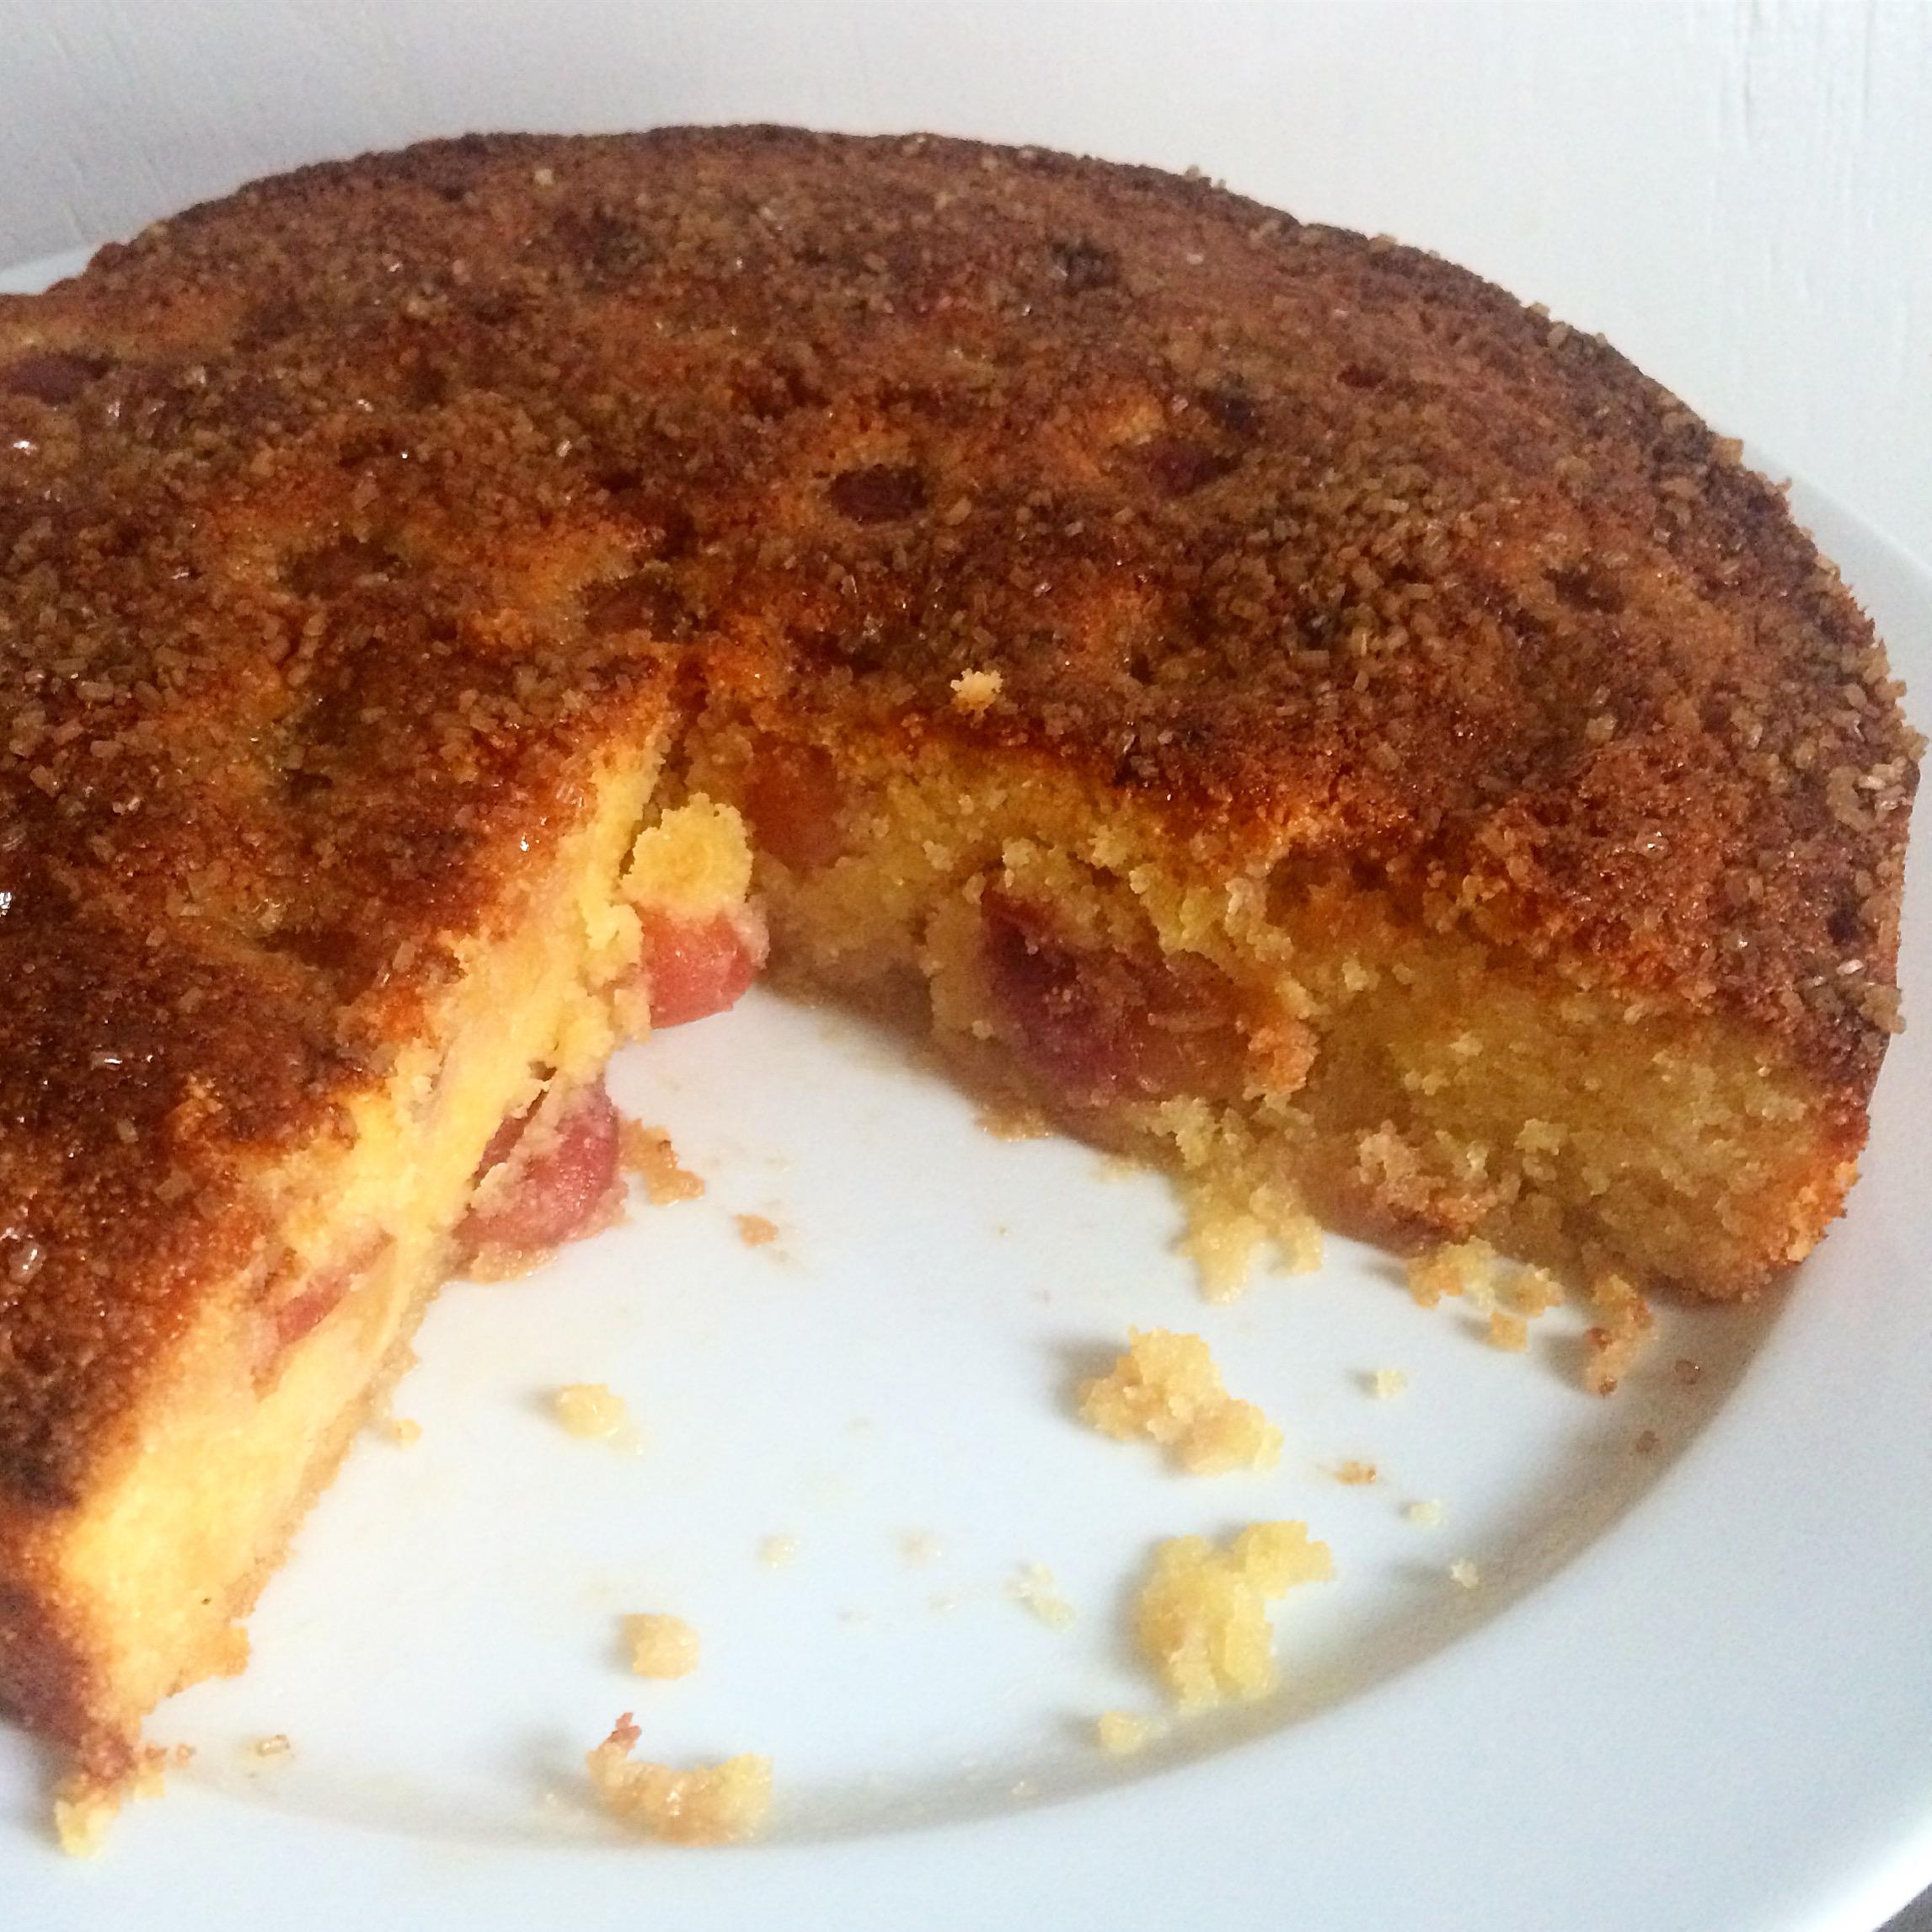 Cherry & almond polenta cake